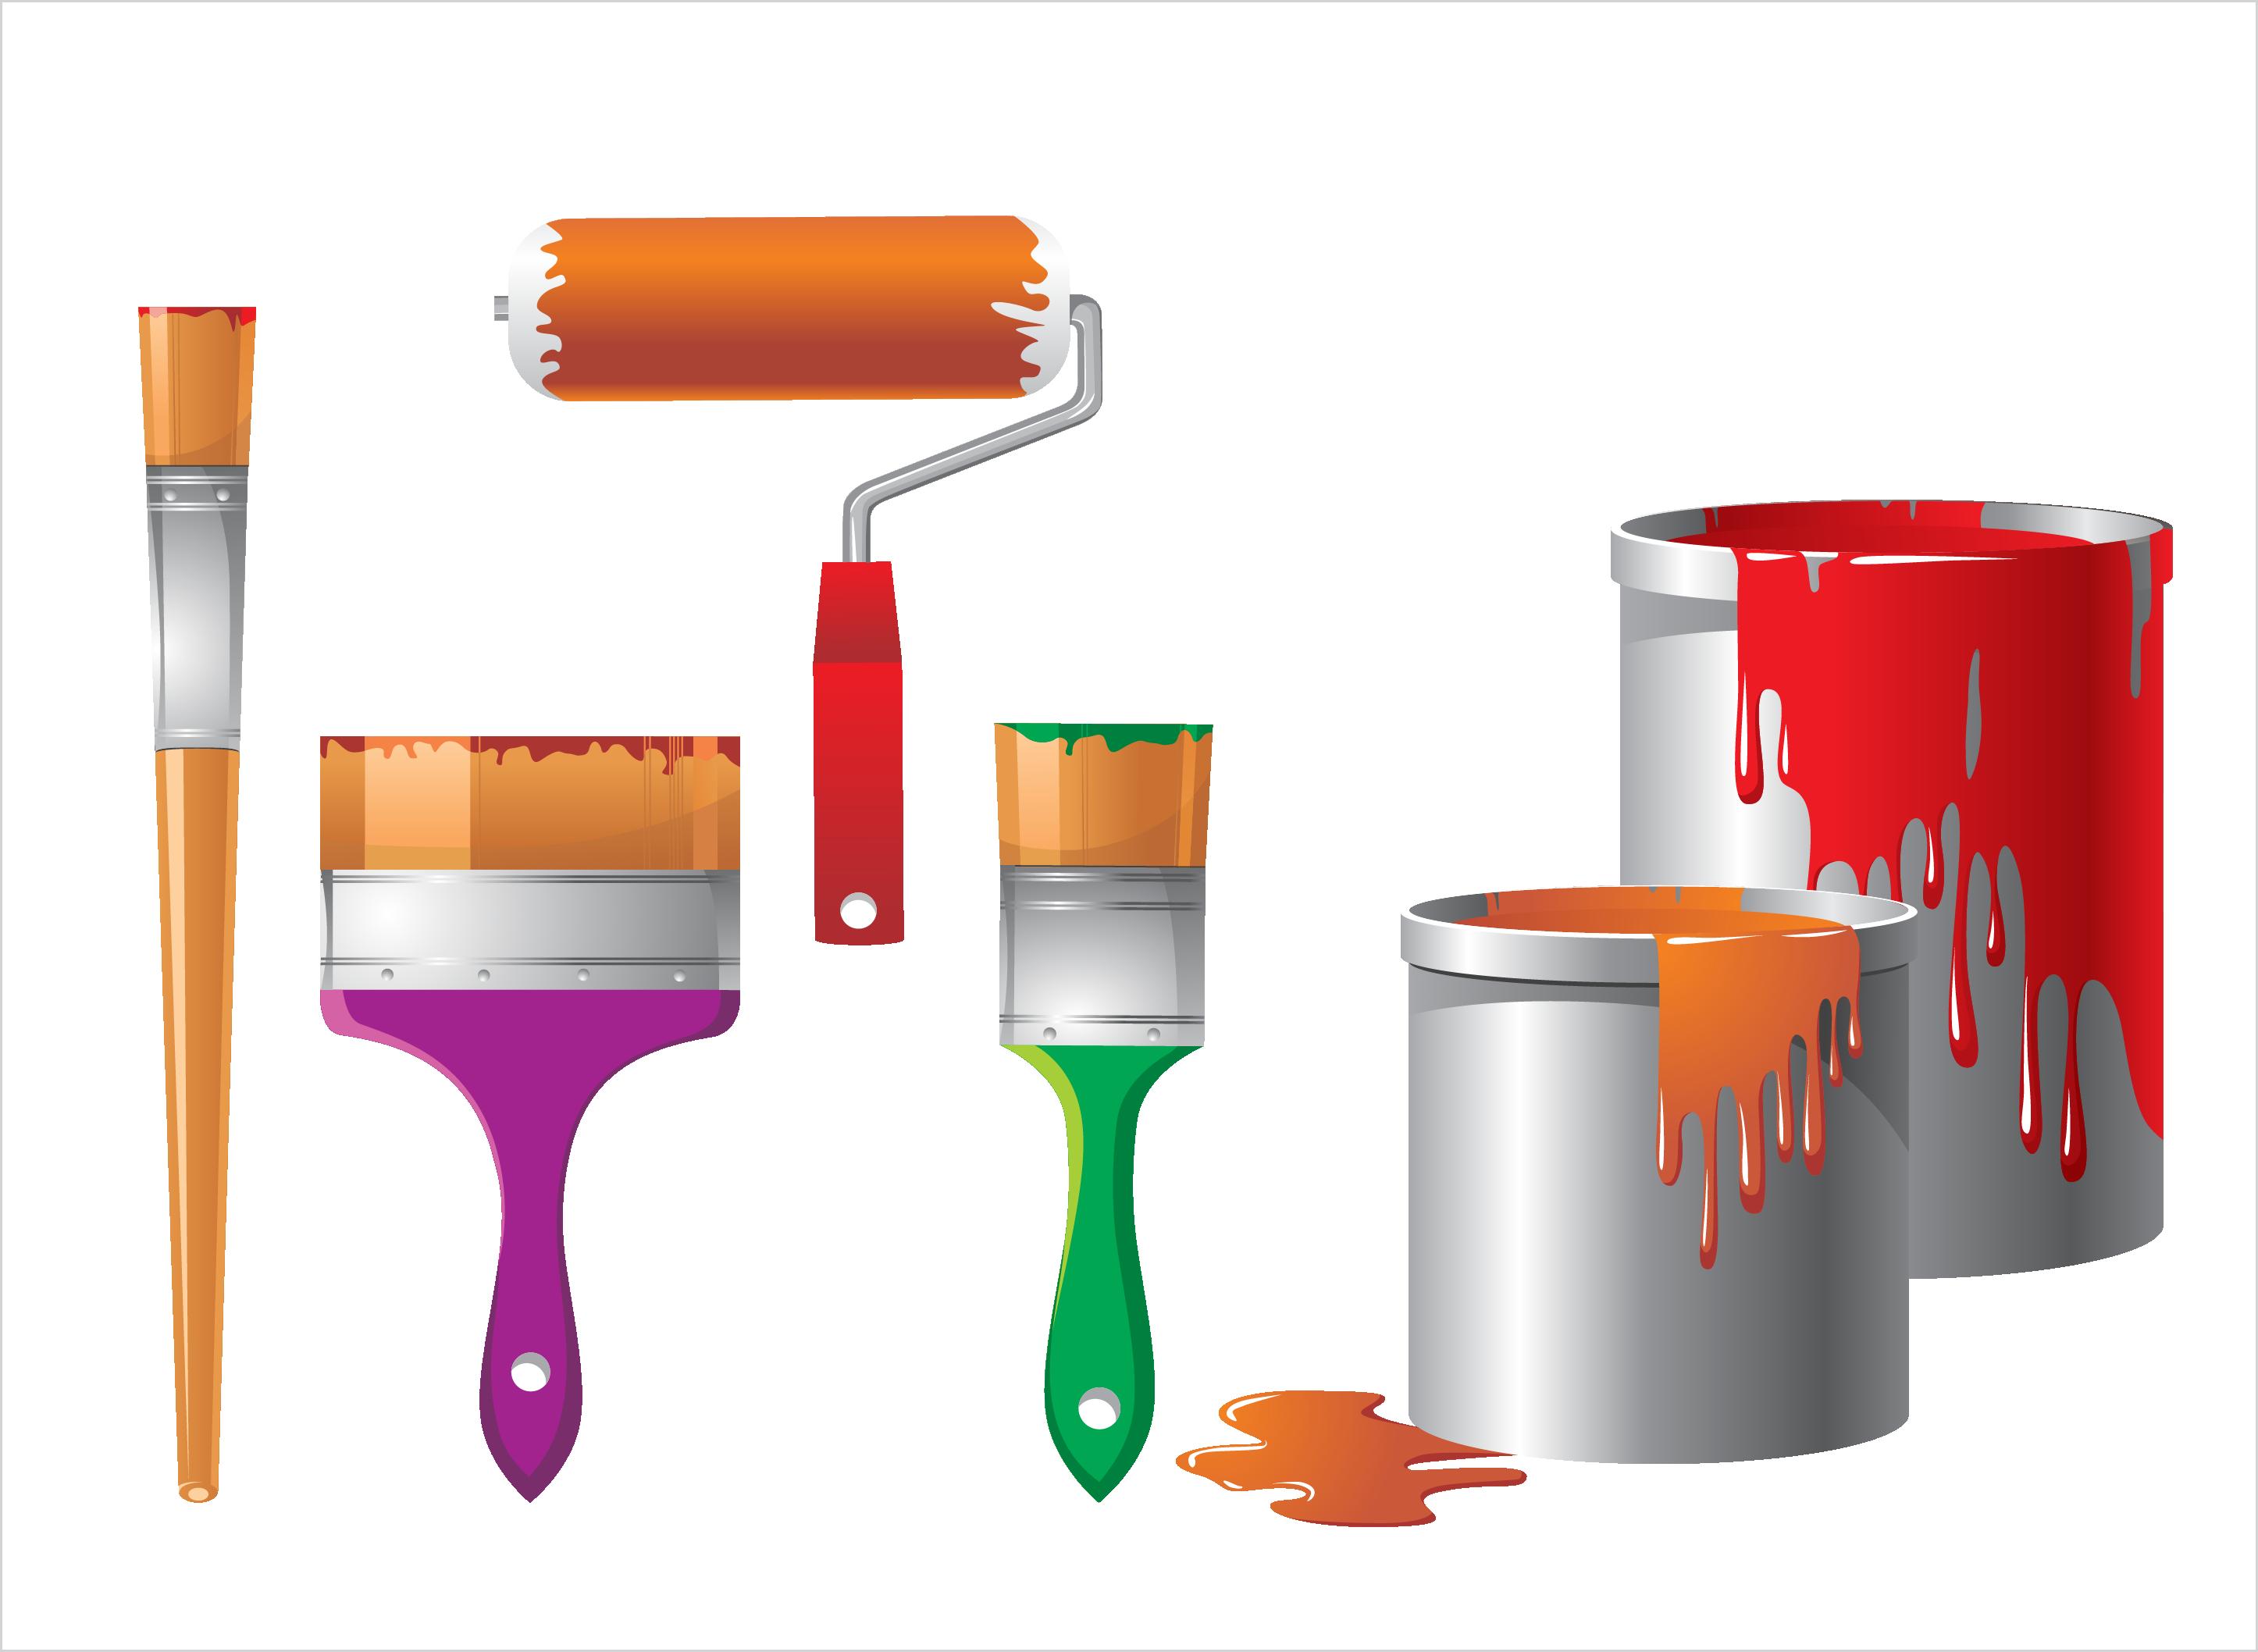 Tool clipart herramientas. Painting bucket clip art